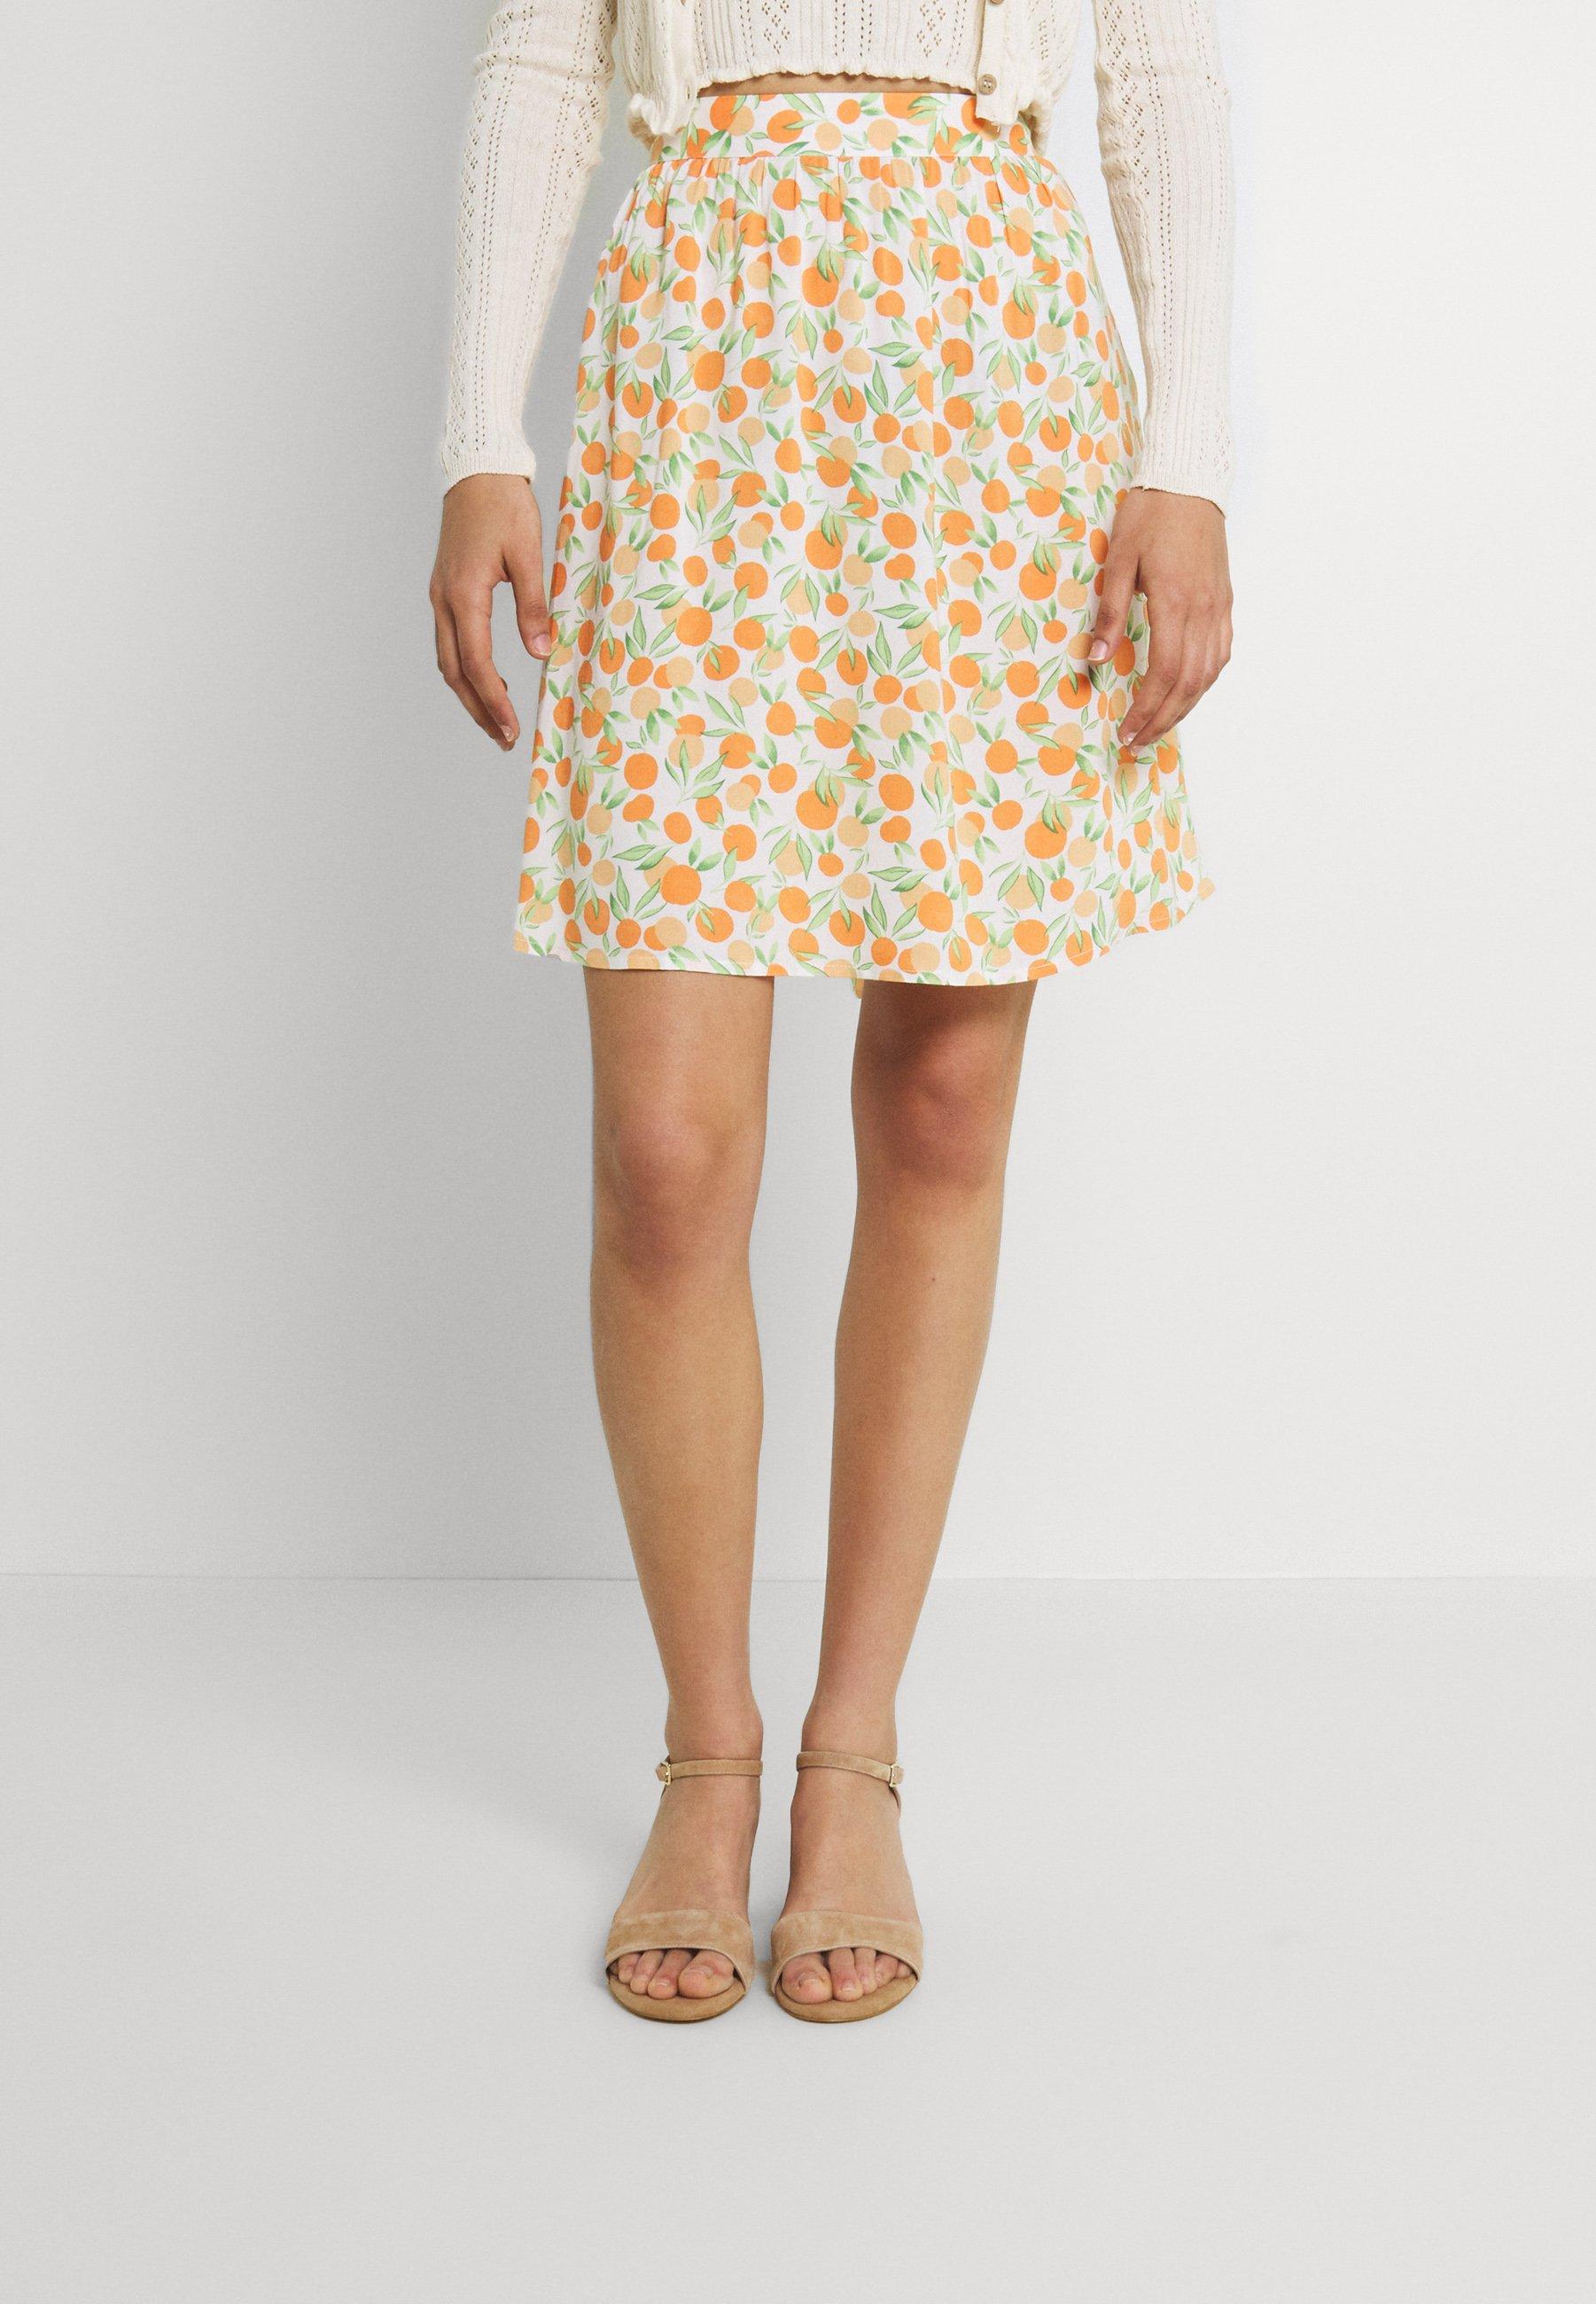 Femme PCNYA SKIRT - Minijupe